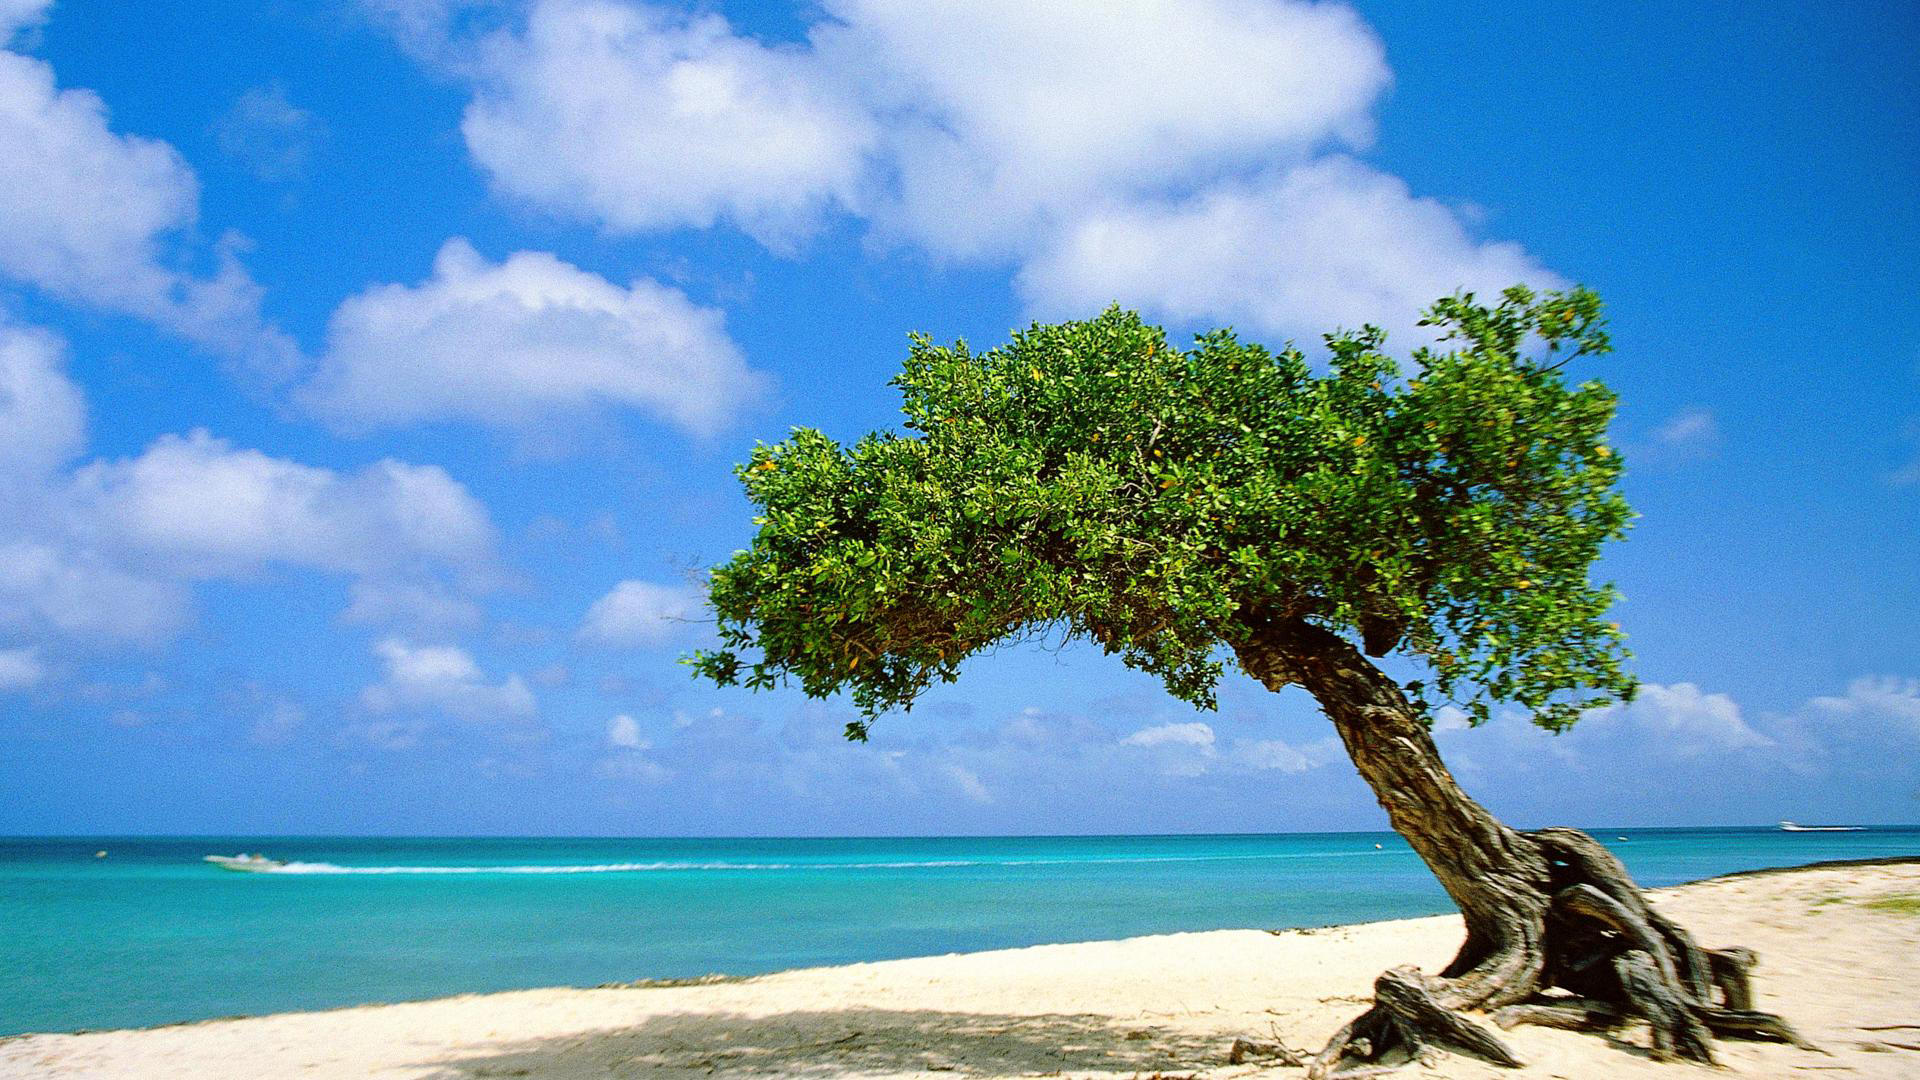 aruba-bonaire-and-curacao-off-season-travel